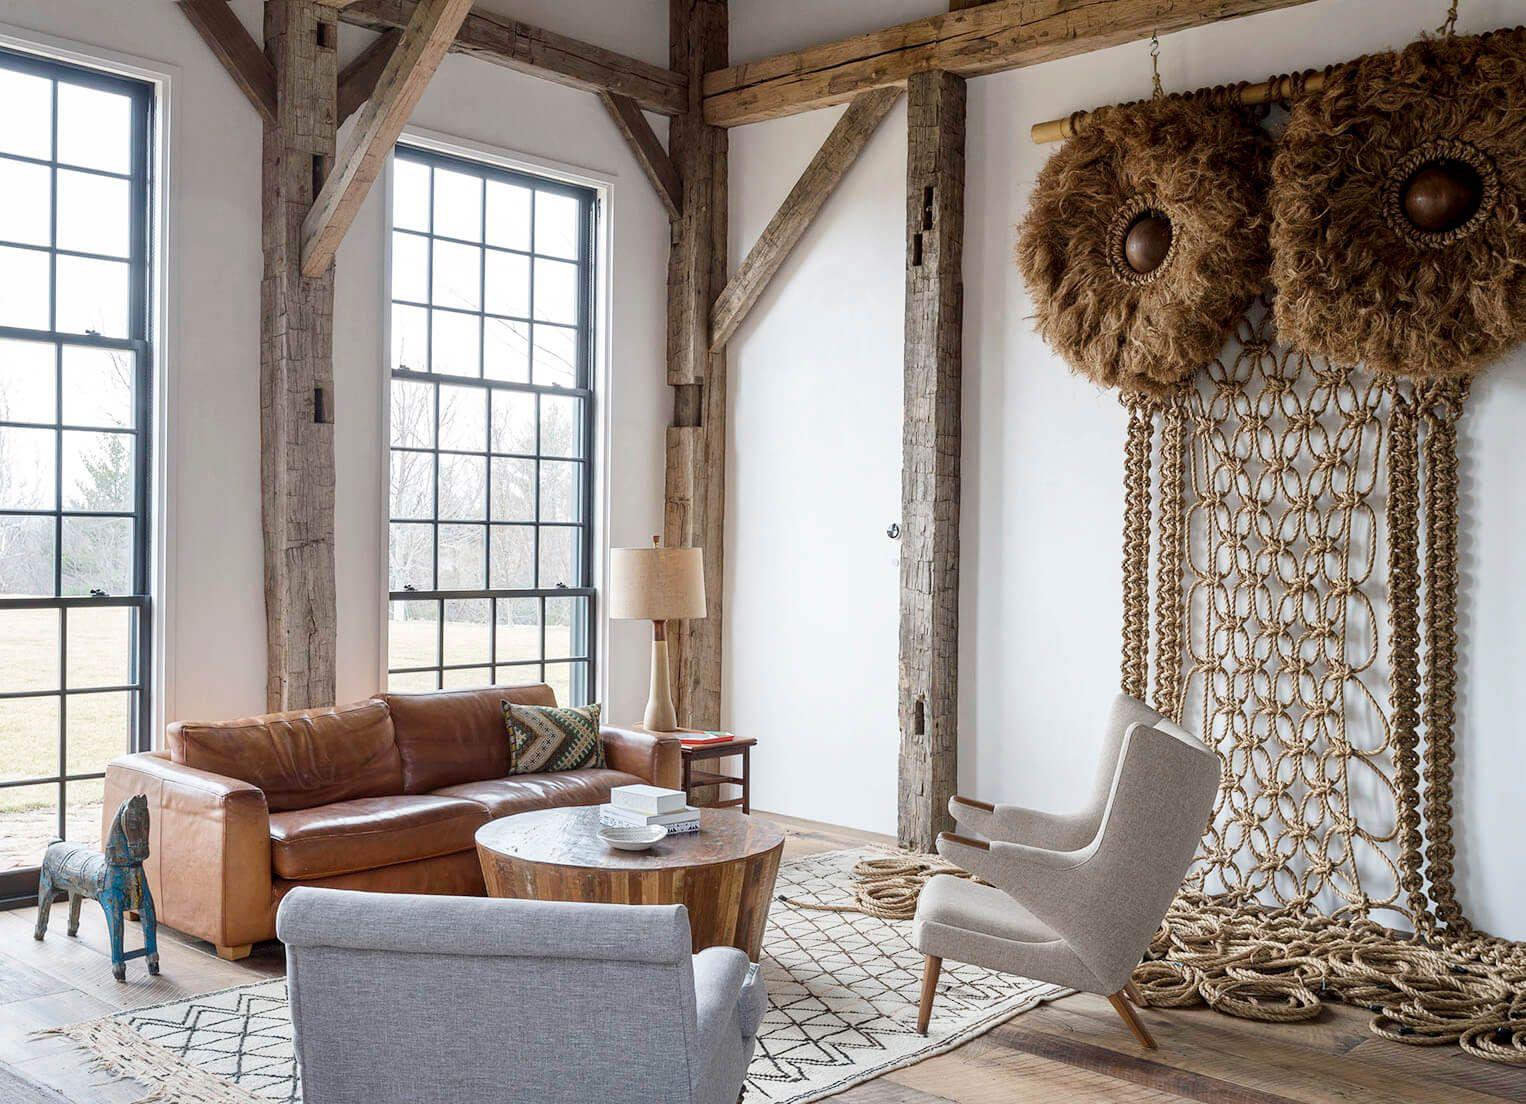 Breathtaking modern farmhouse style retreat in Napa Valley ...